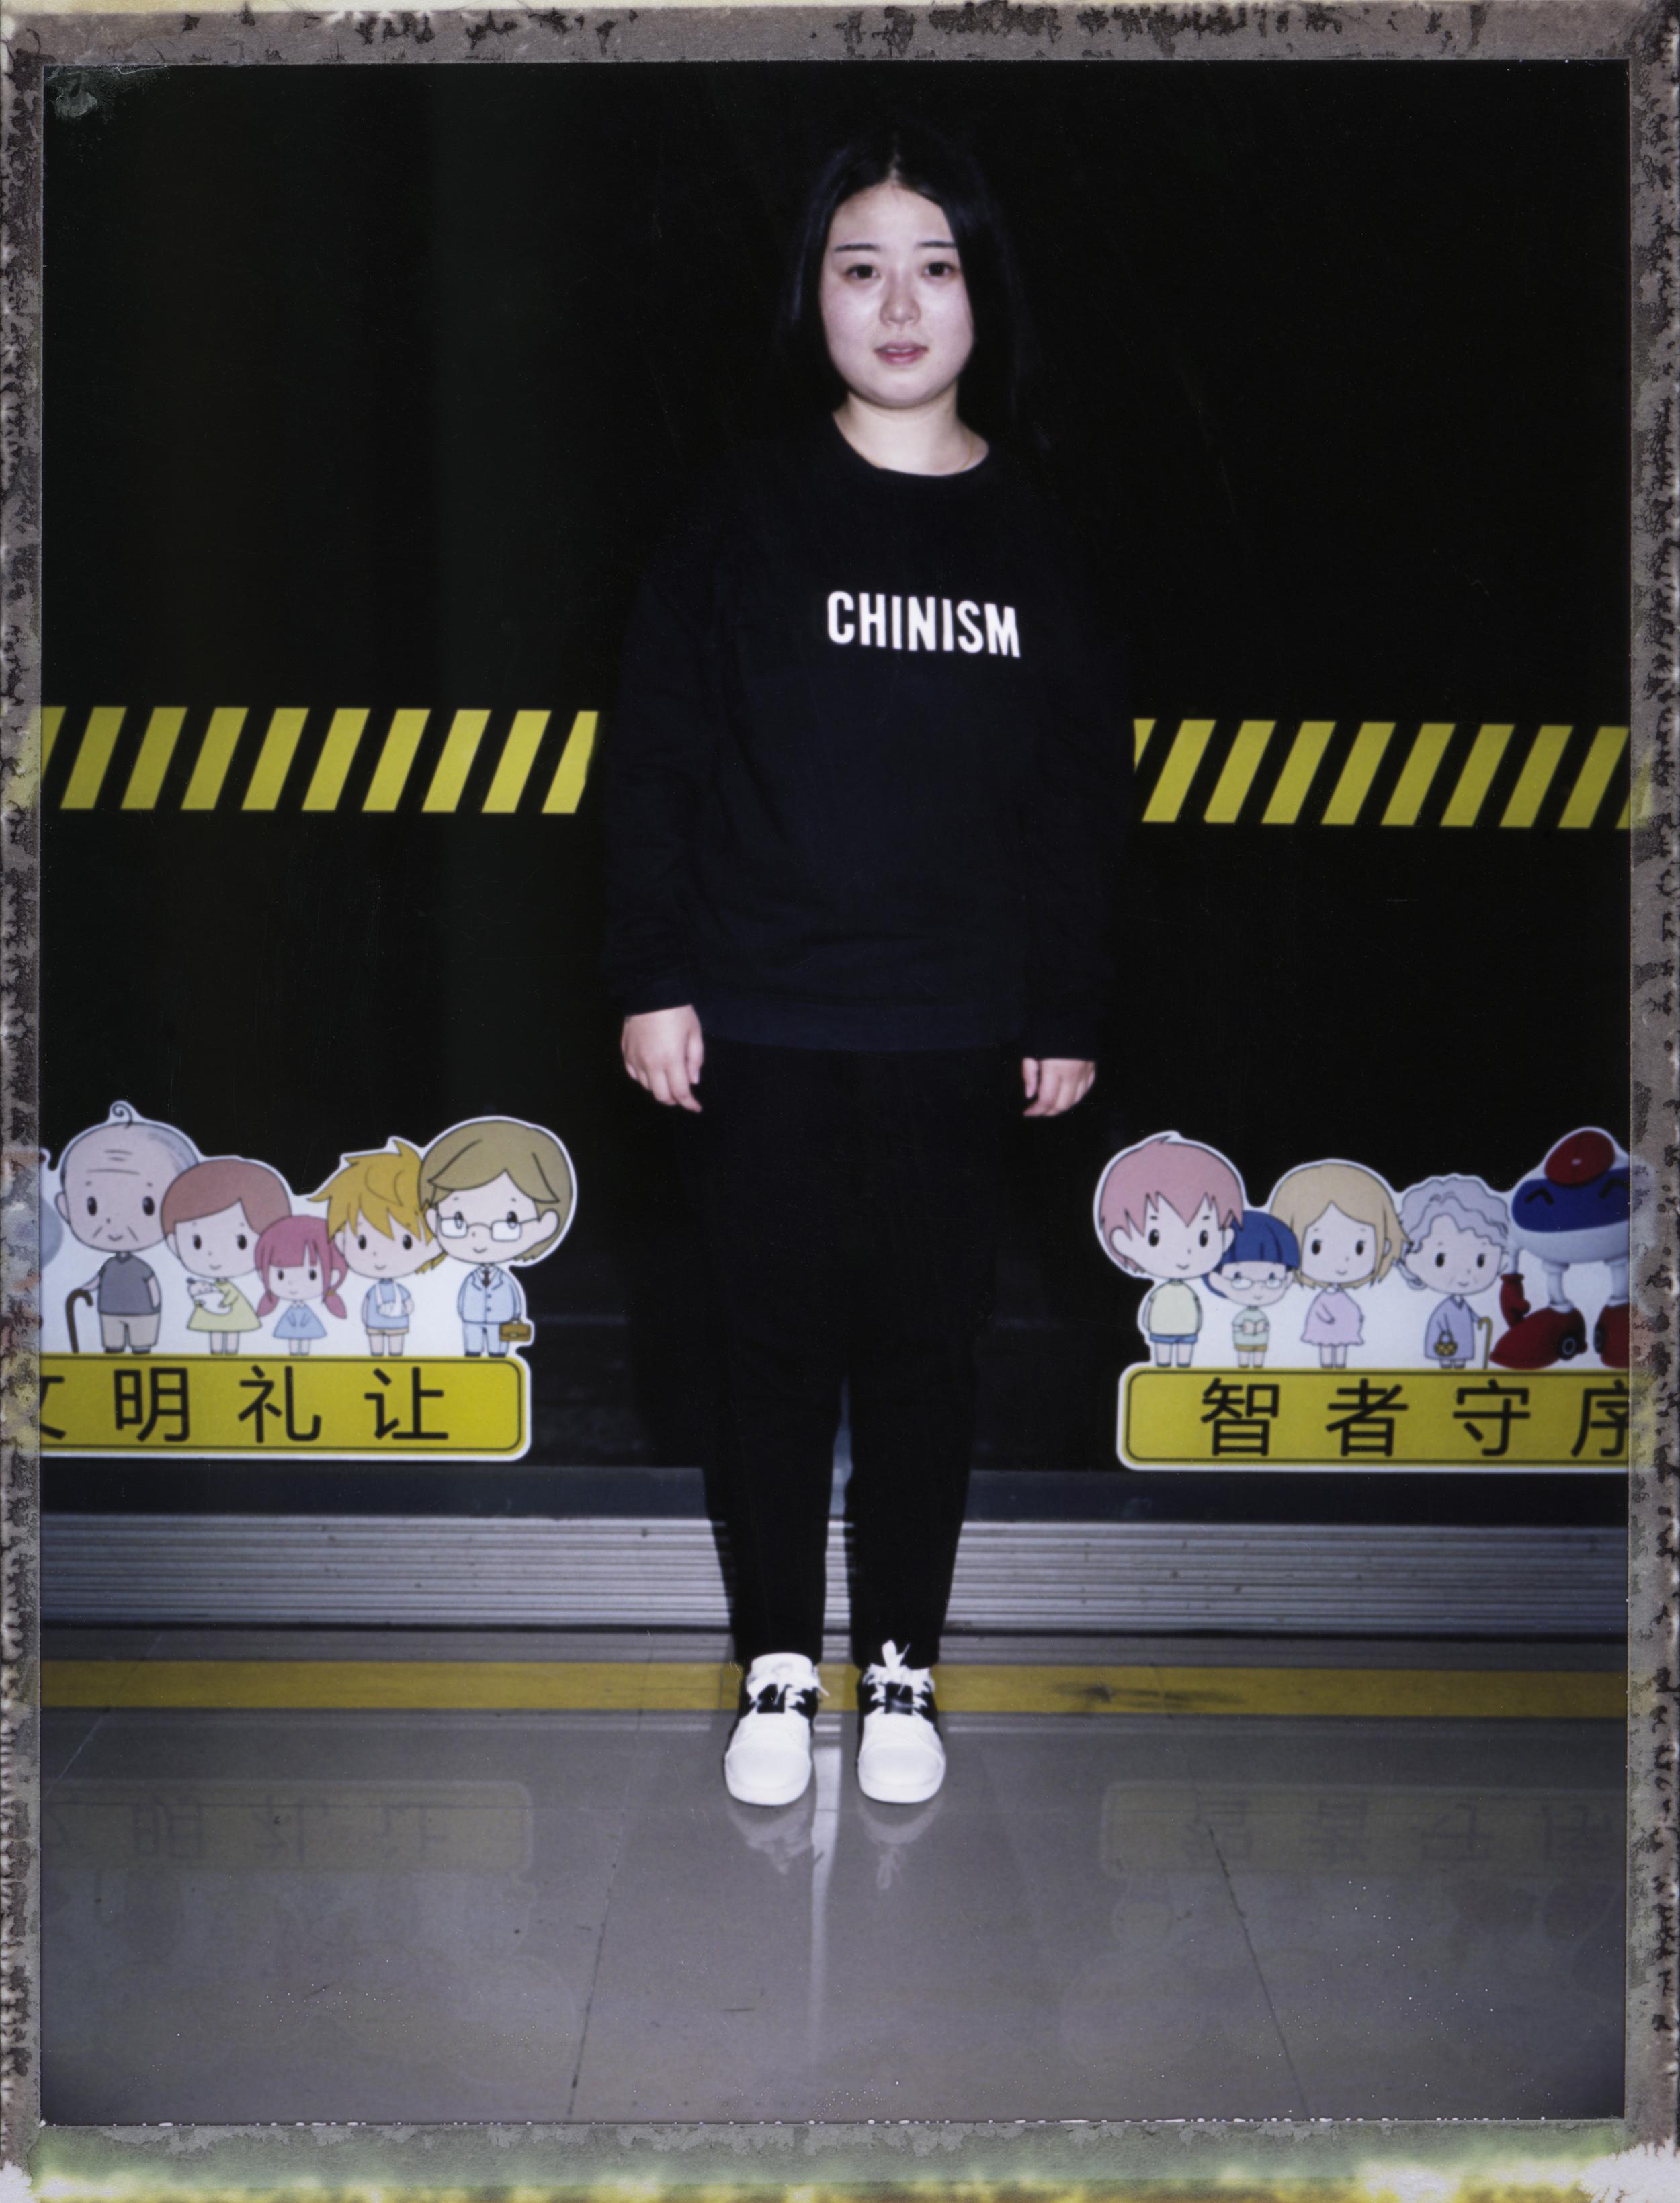 Chinism.jpg